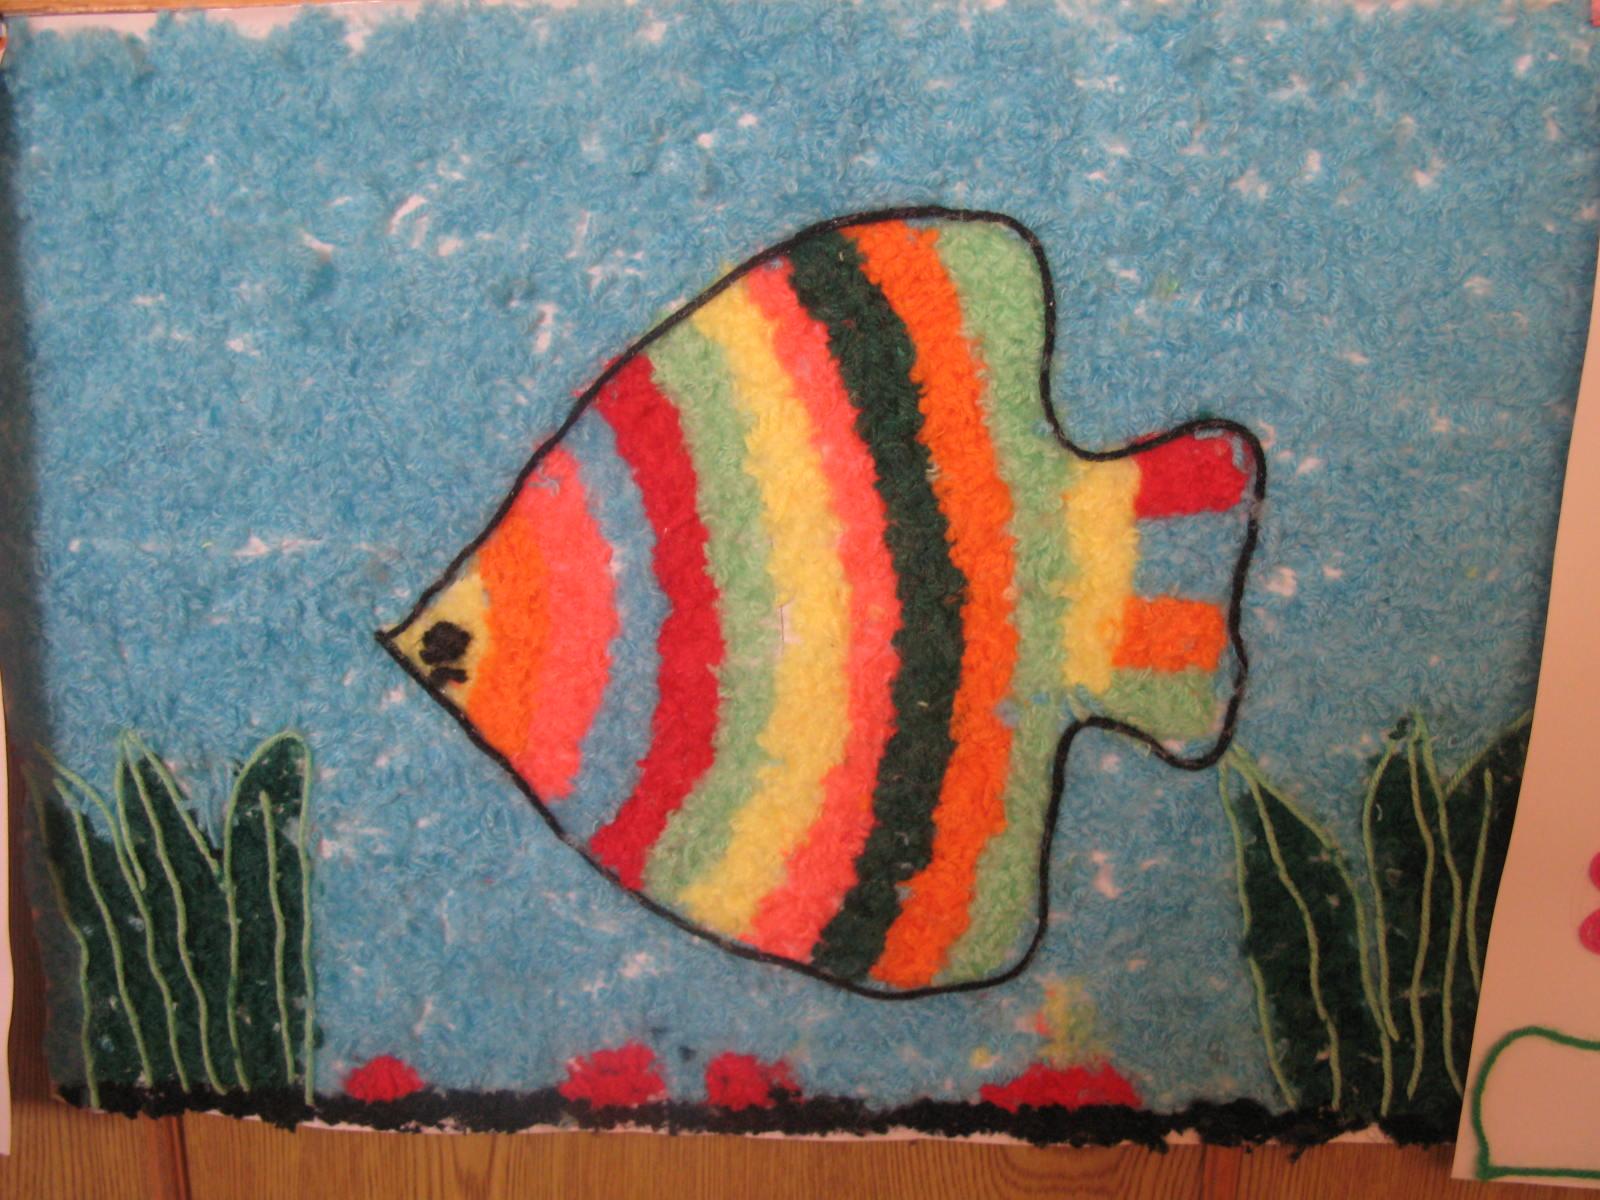 壁纸 动物 鱼 鱼类 1600_1200